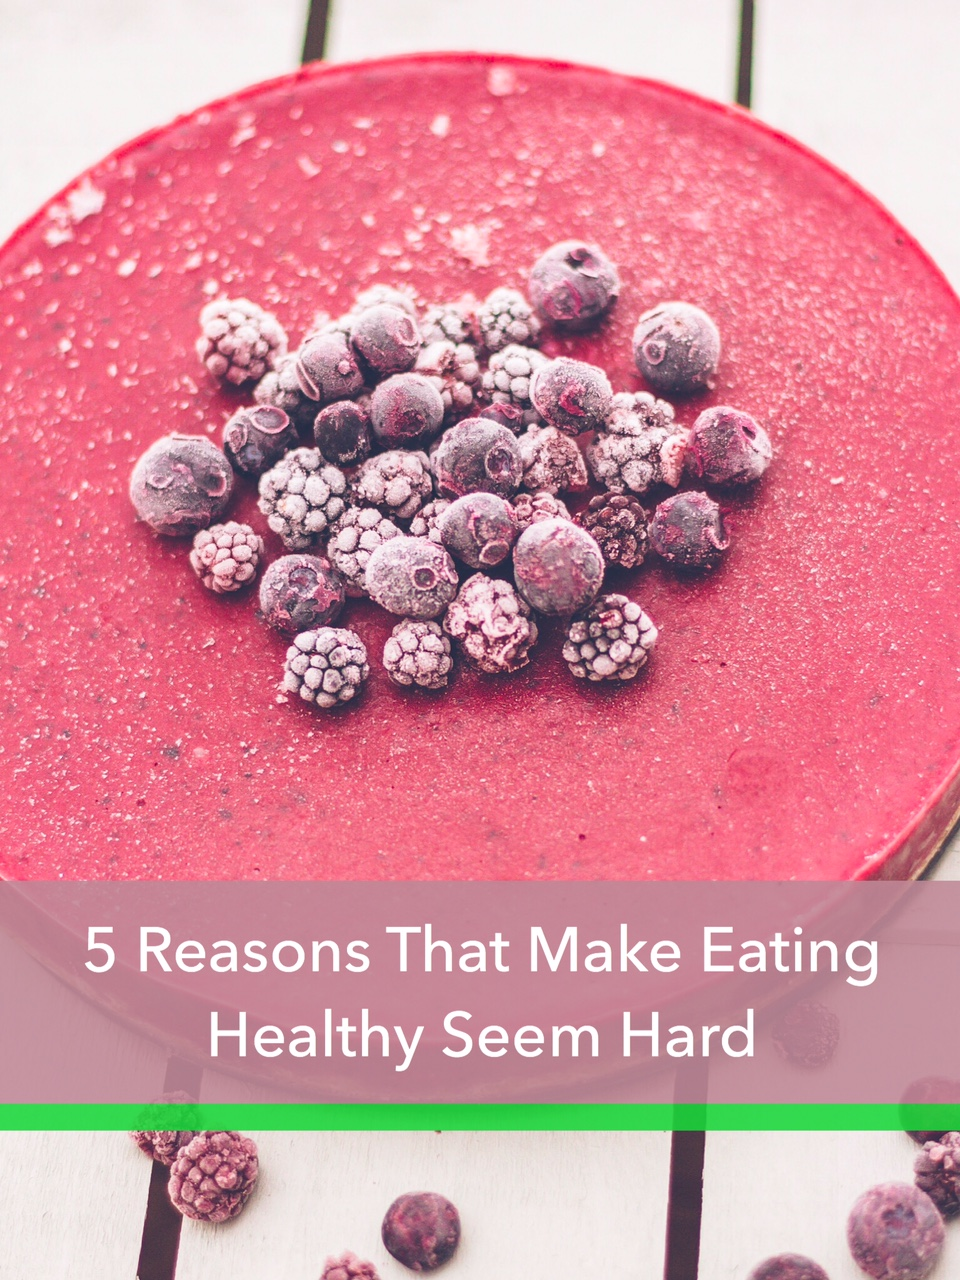 5 reasons eating healthy seem hard